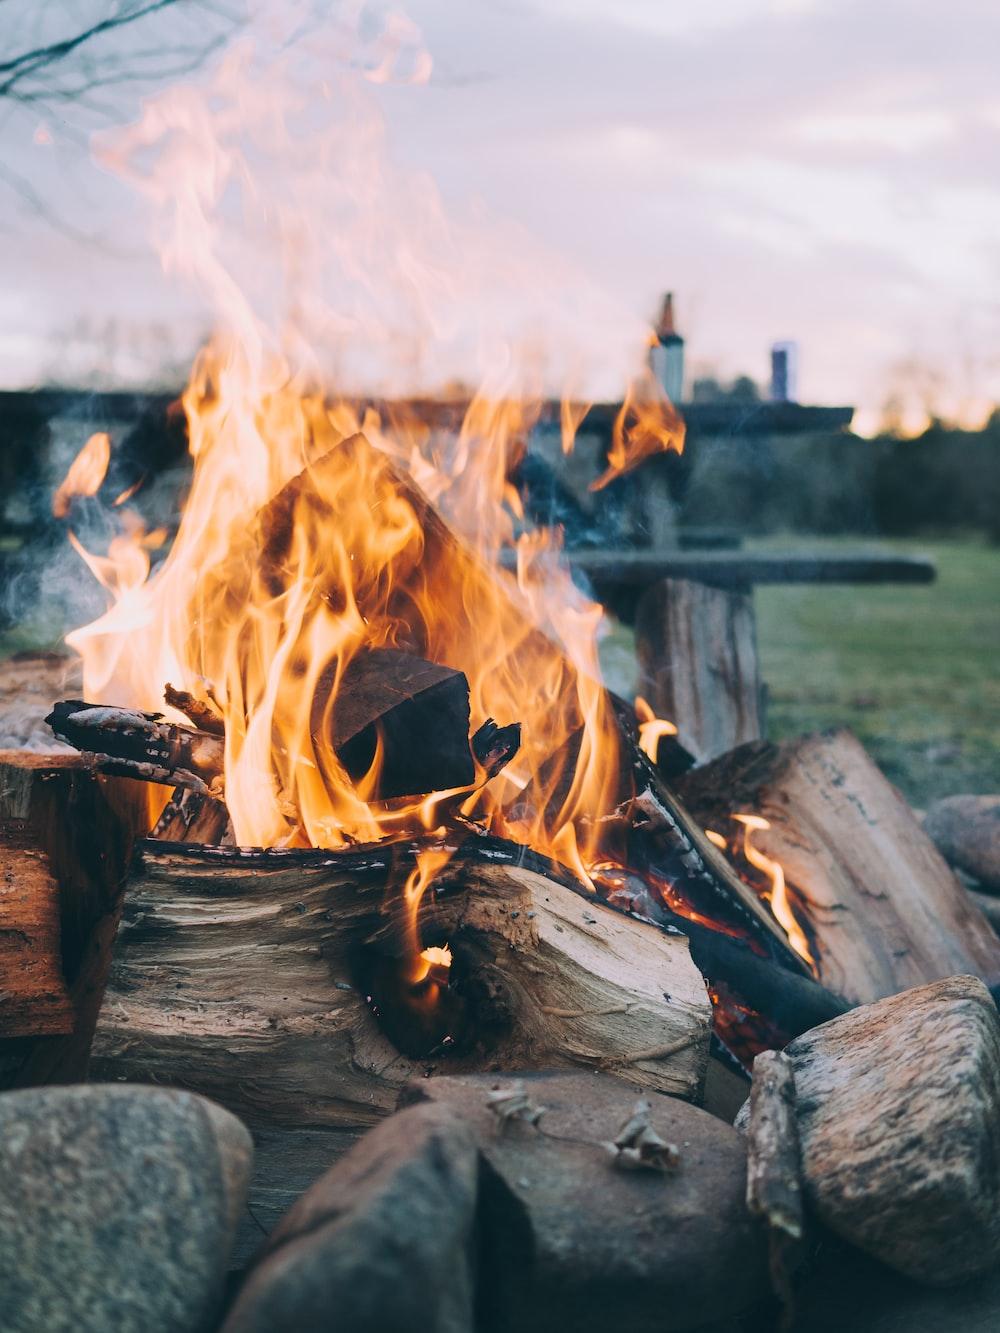 selective focus photography of bonfire